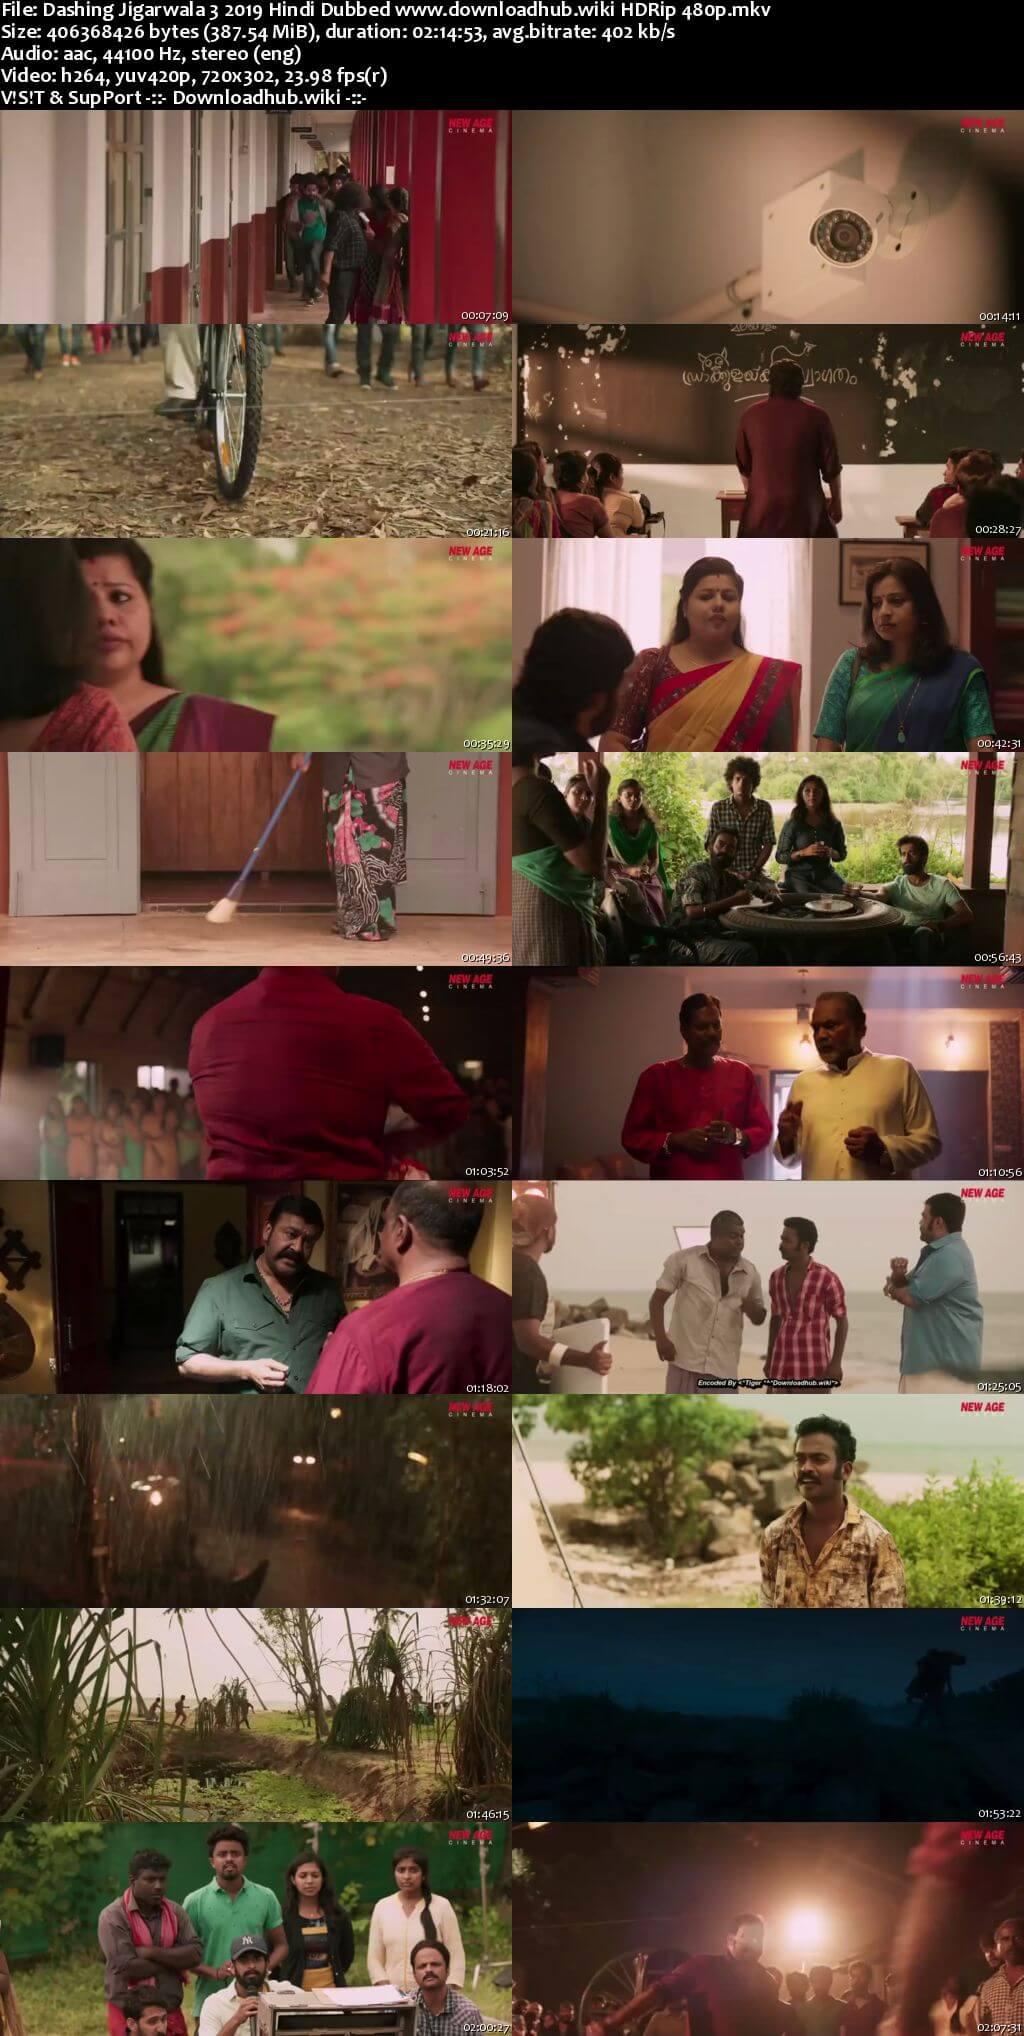 Dashing Jigarwala 3 2019 Hindi Dubbed 350MB HDRip 480p